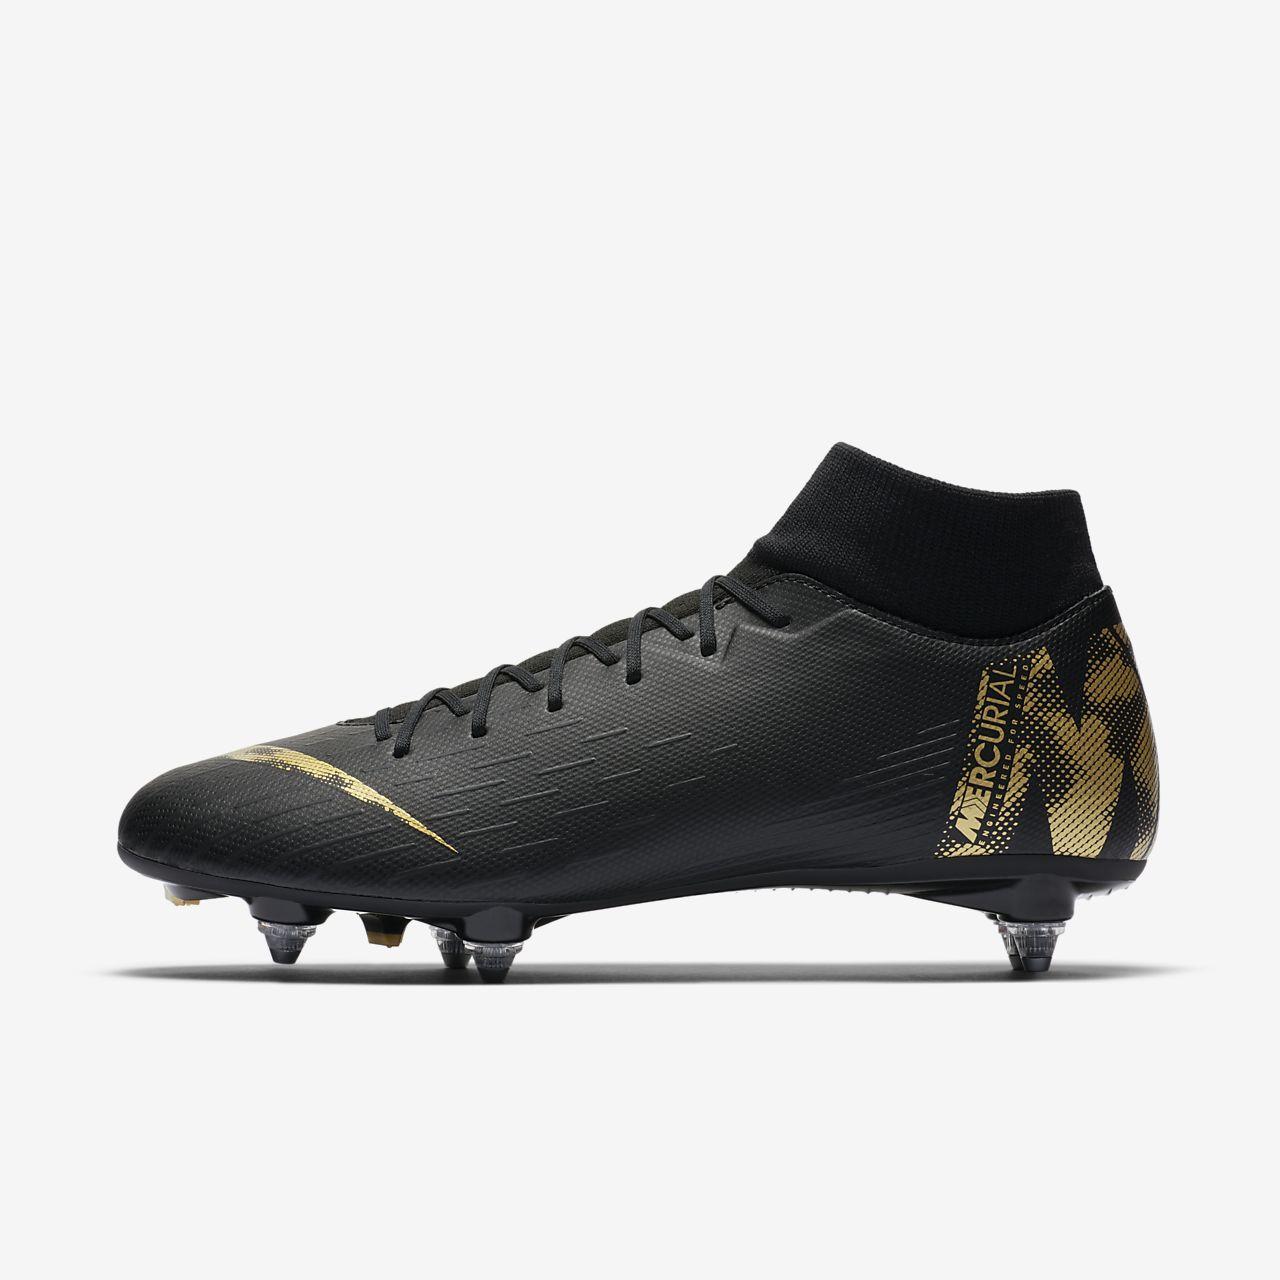 Chaussure de football à crampons pour terrain gras Nike Mercurial Superfly VI Academy SG-PRO